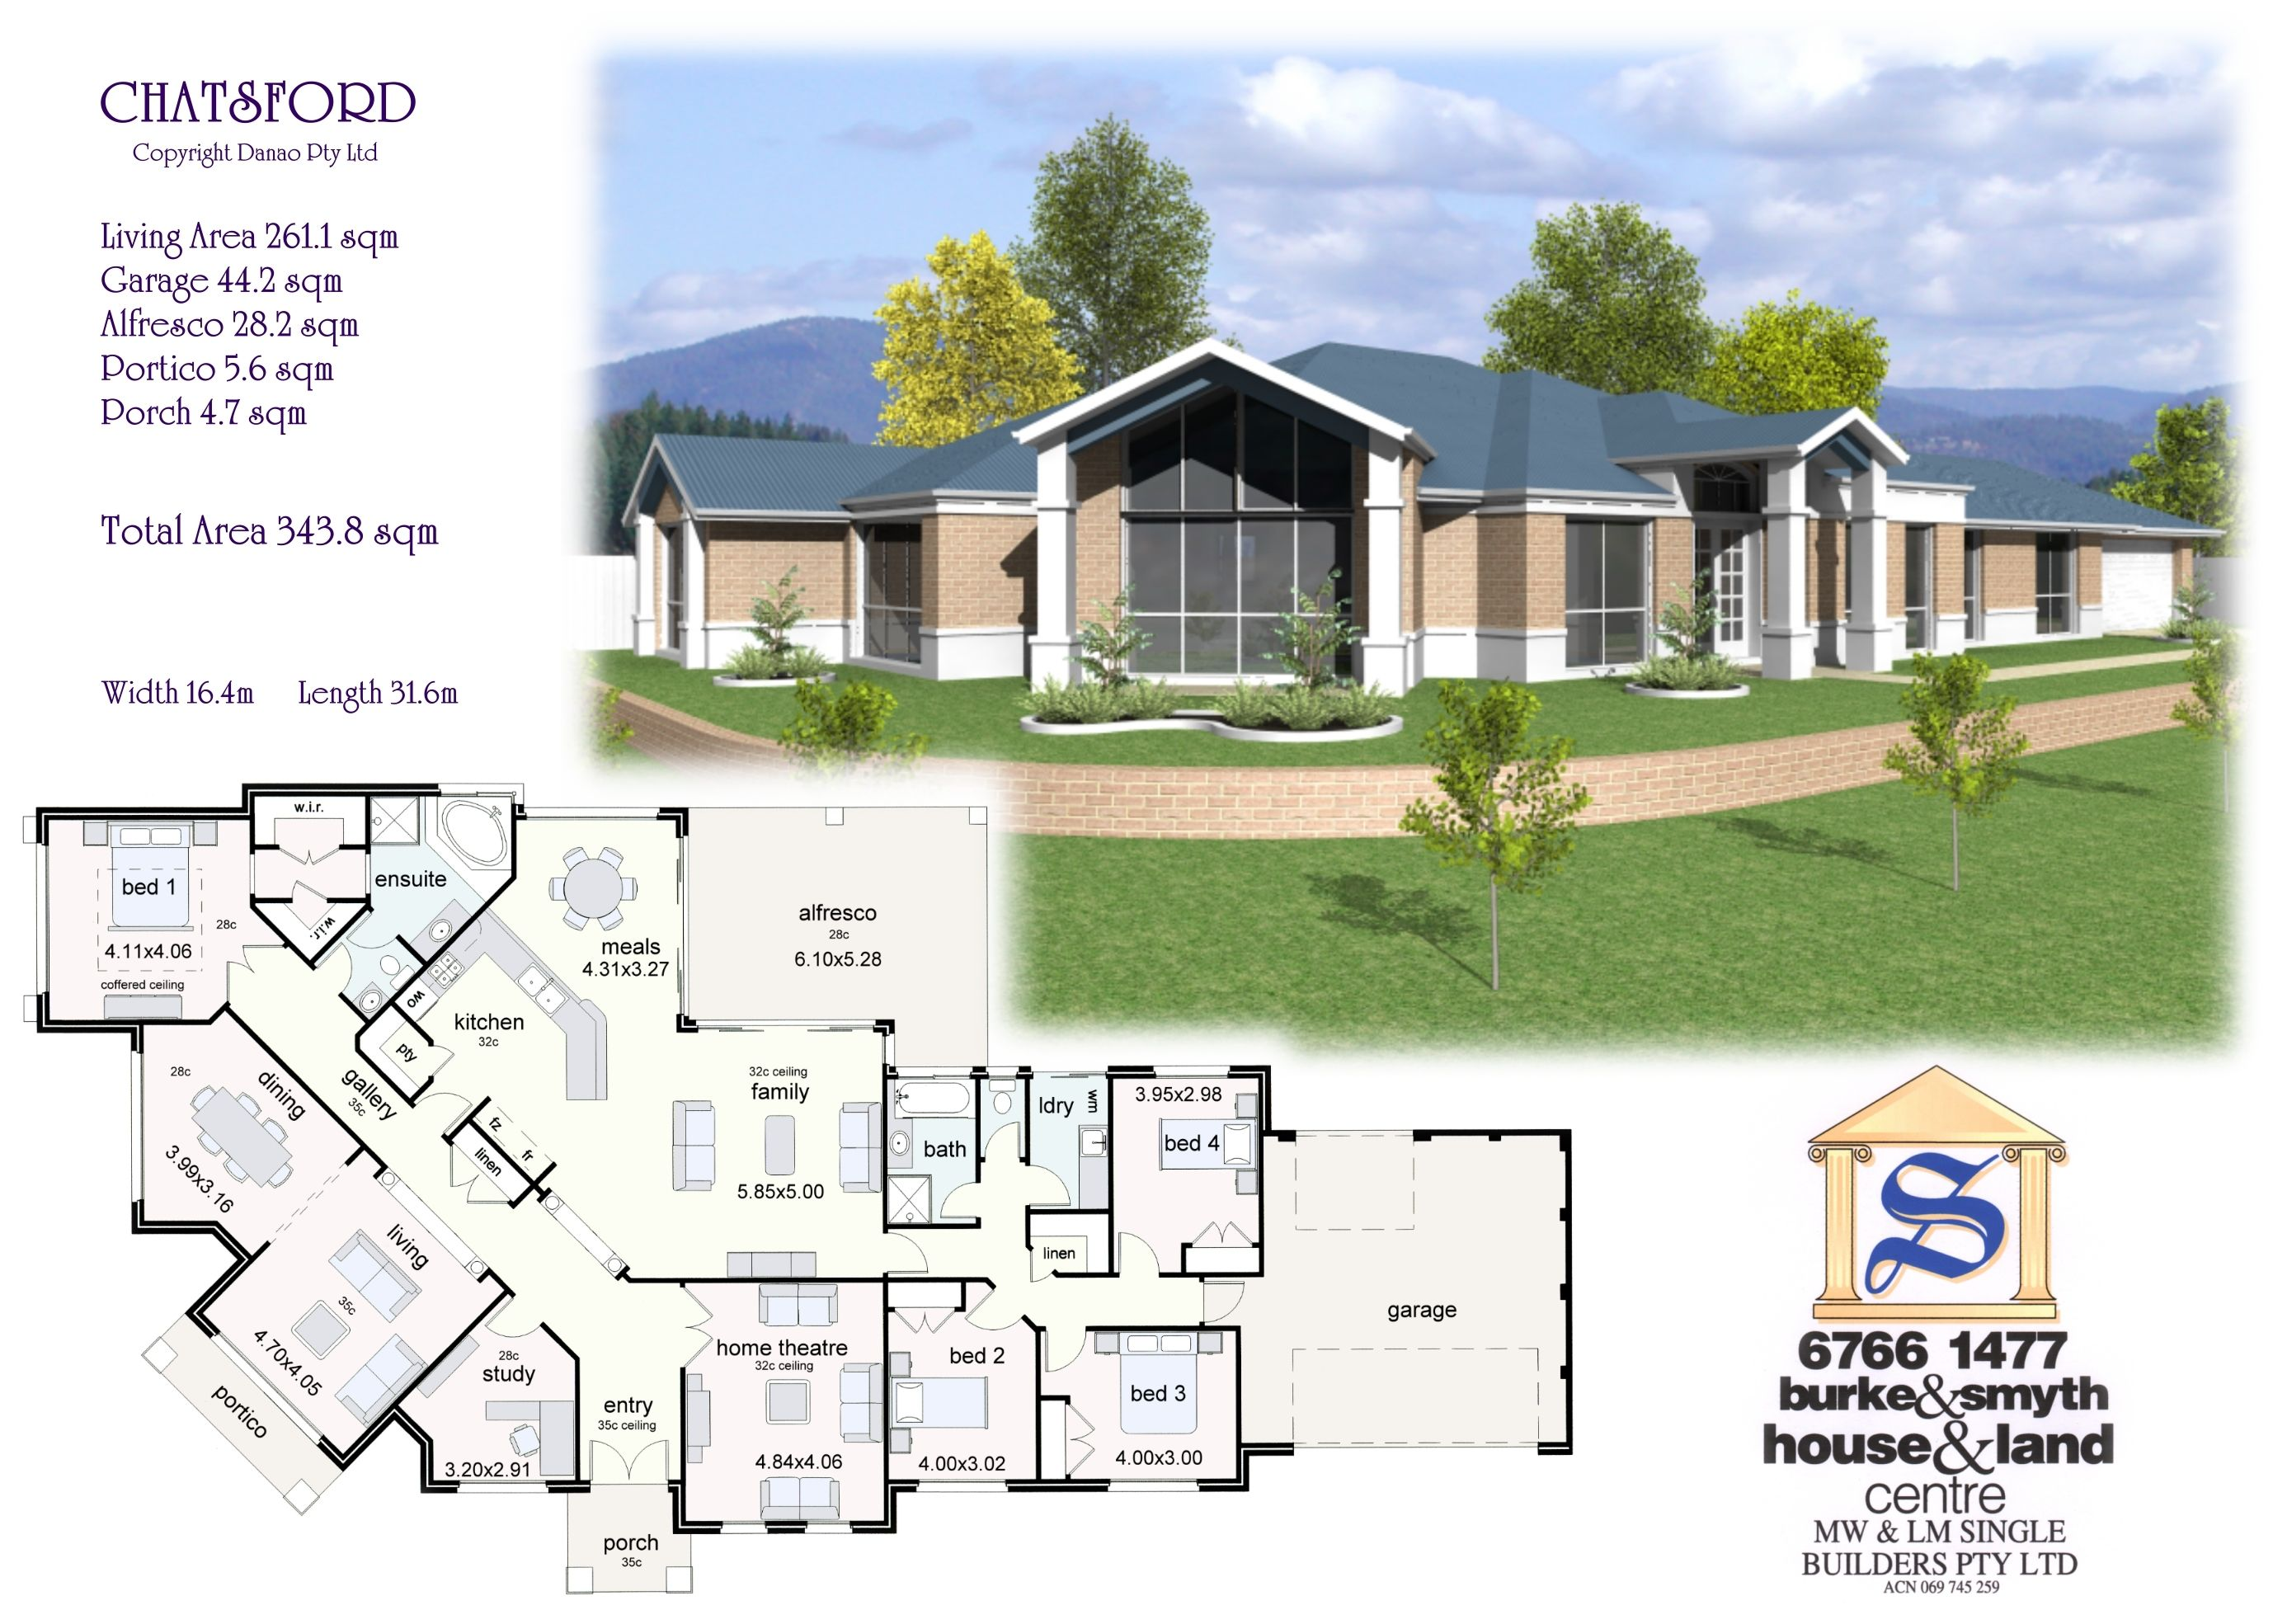 Single Builders I Chatsford House Plan Pool House Plans House Blueprints House Plans